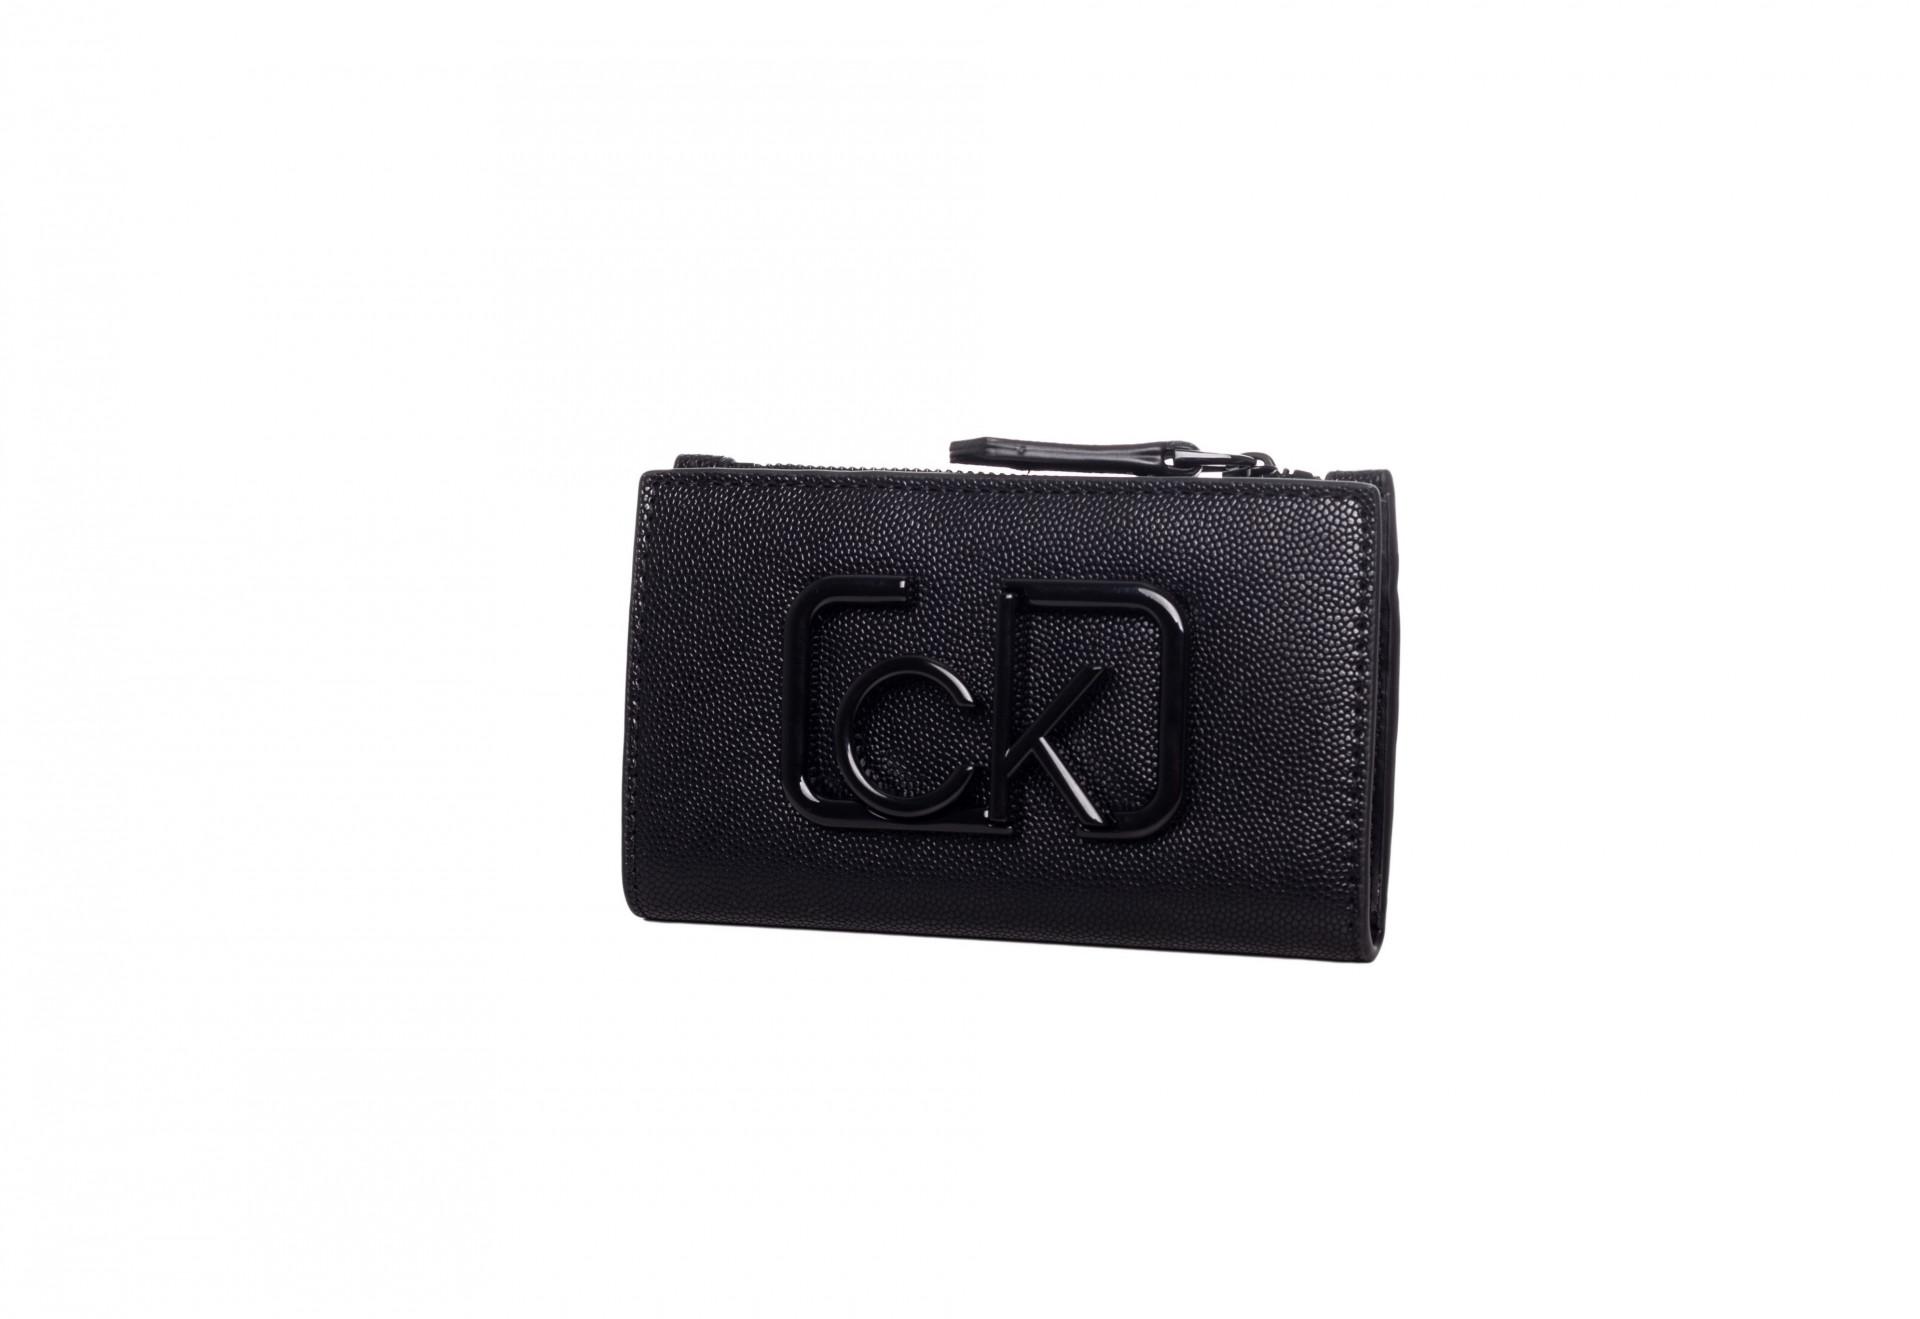 Calvin Klein Calvin Klein dámská černá peněženka Signature NS Cardholder